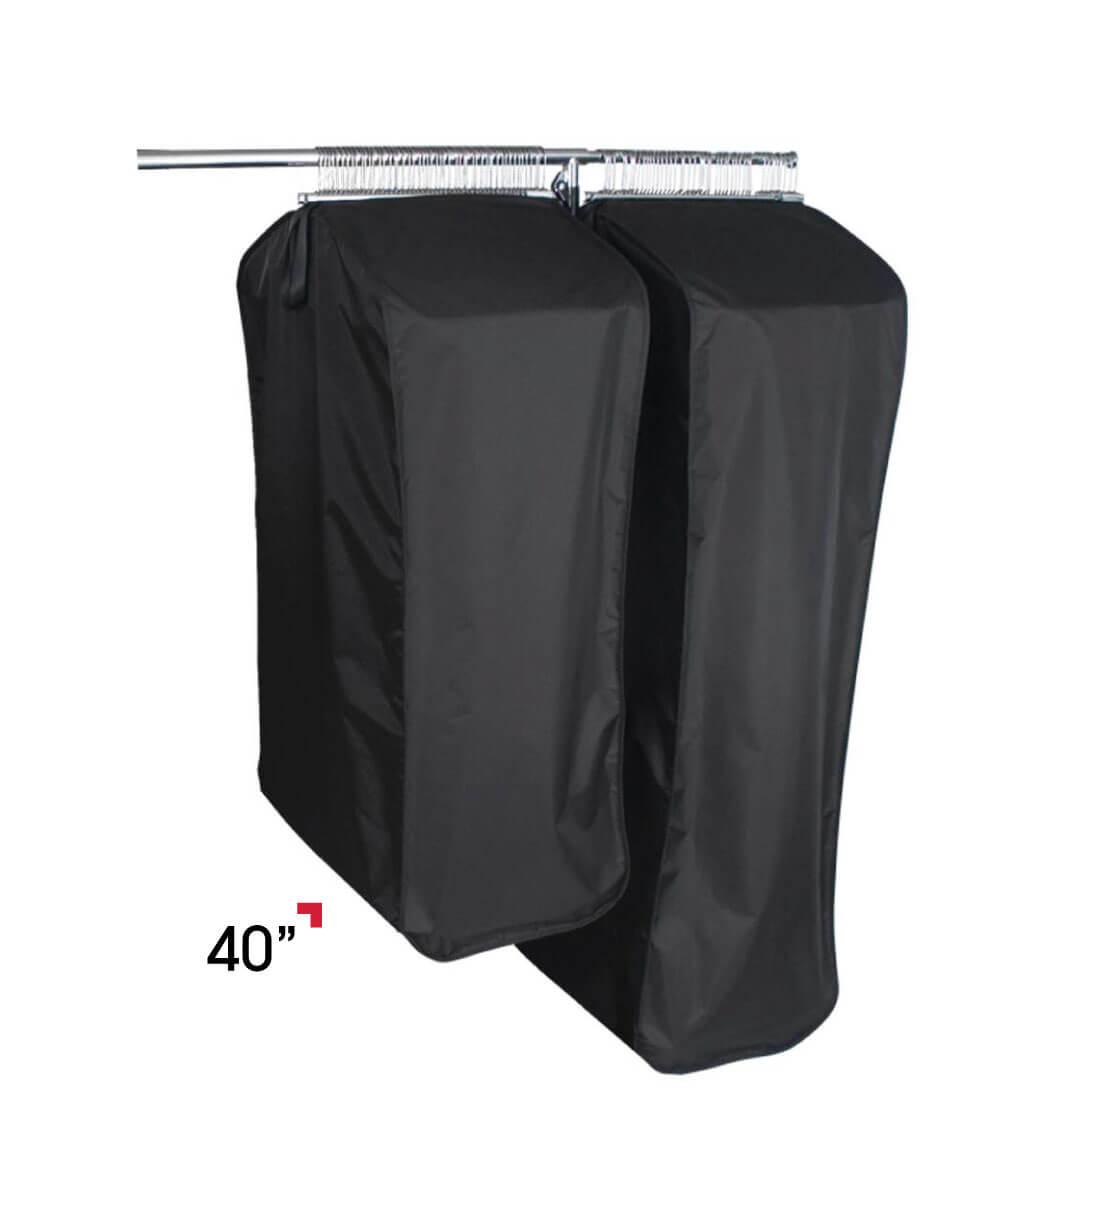 40 inch garment bag